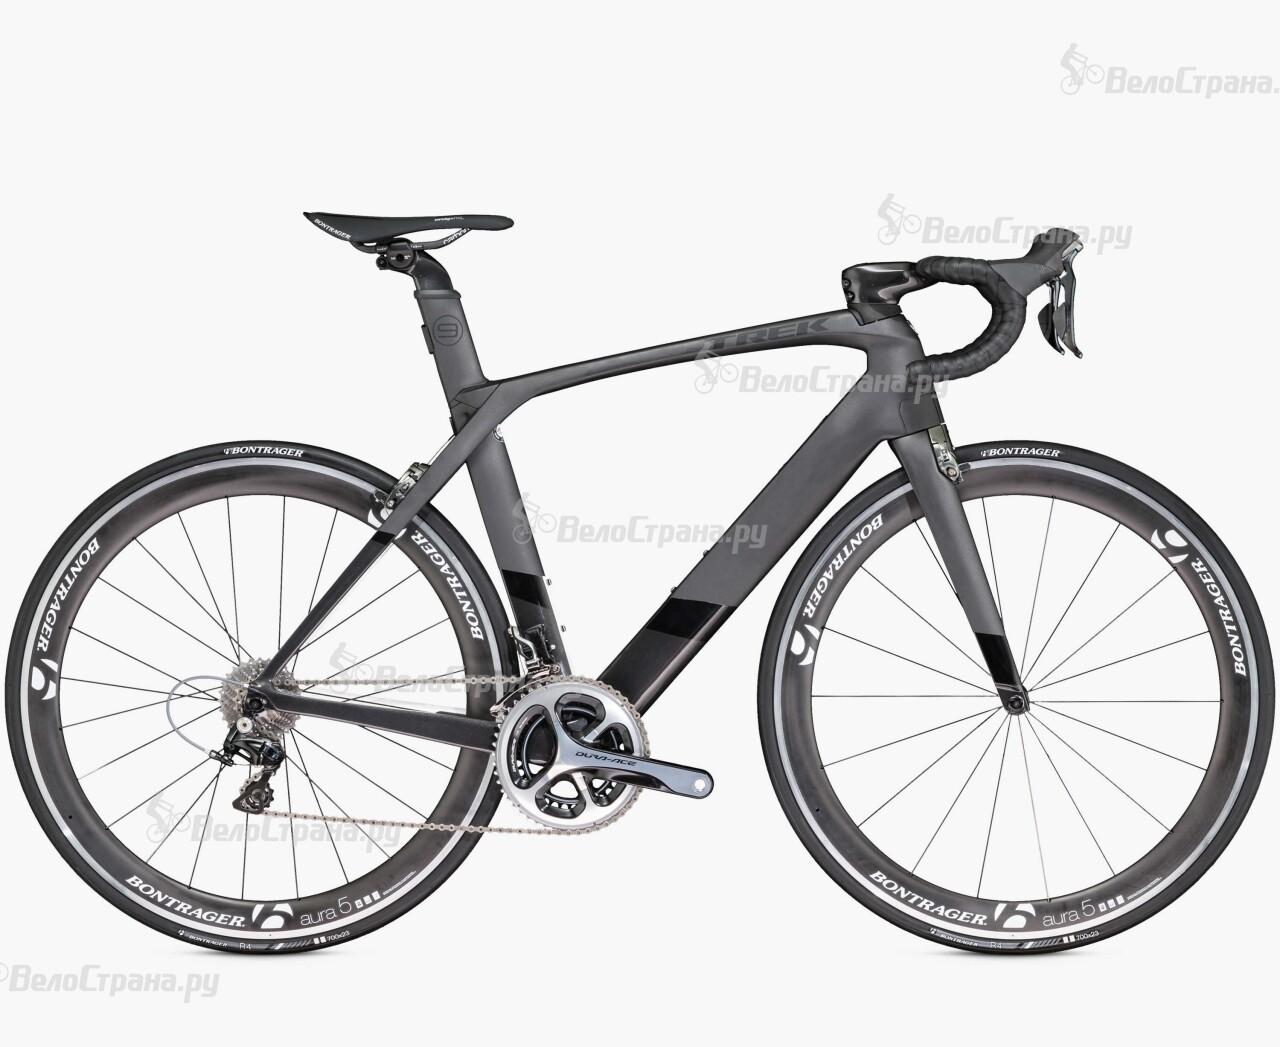 Велосипед Trek Madone 9.5 (2016) велосипед trek madone 7 9 2015